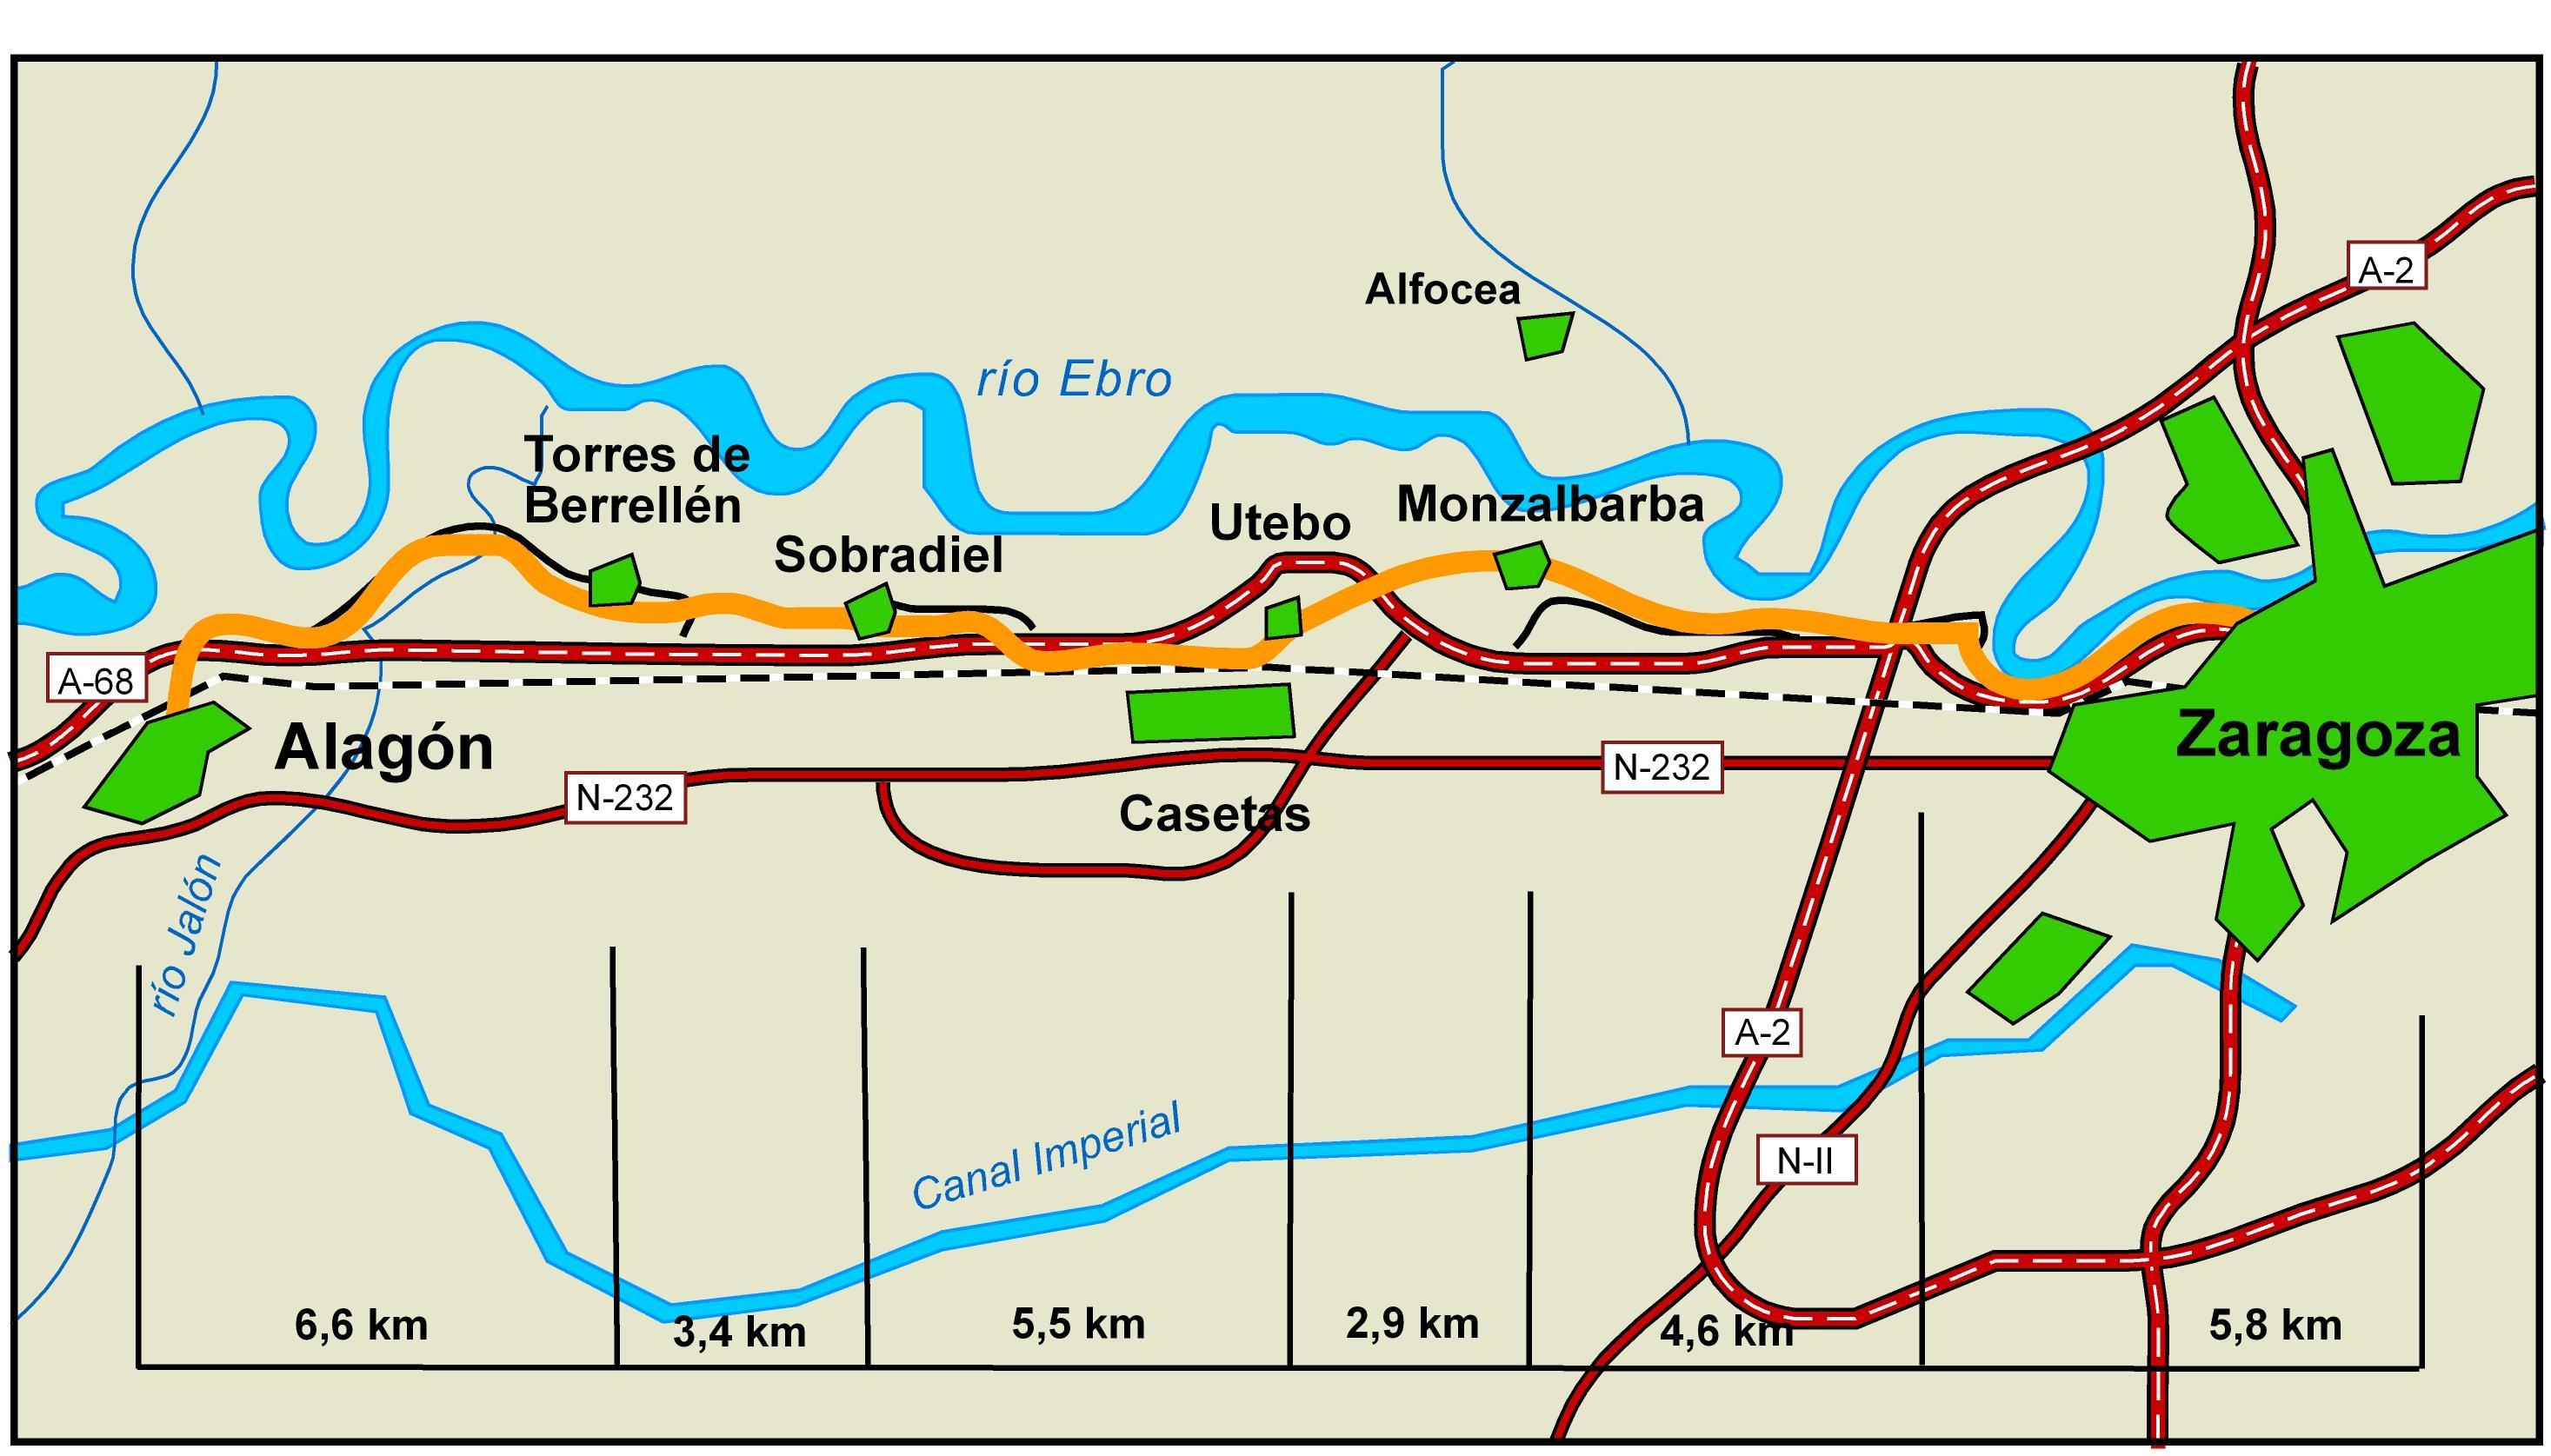 Imagen de Alagón mapa 50630 5